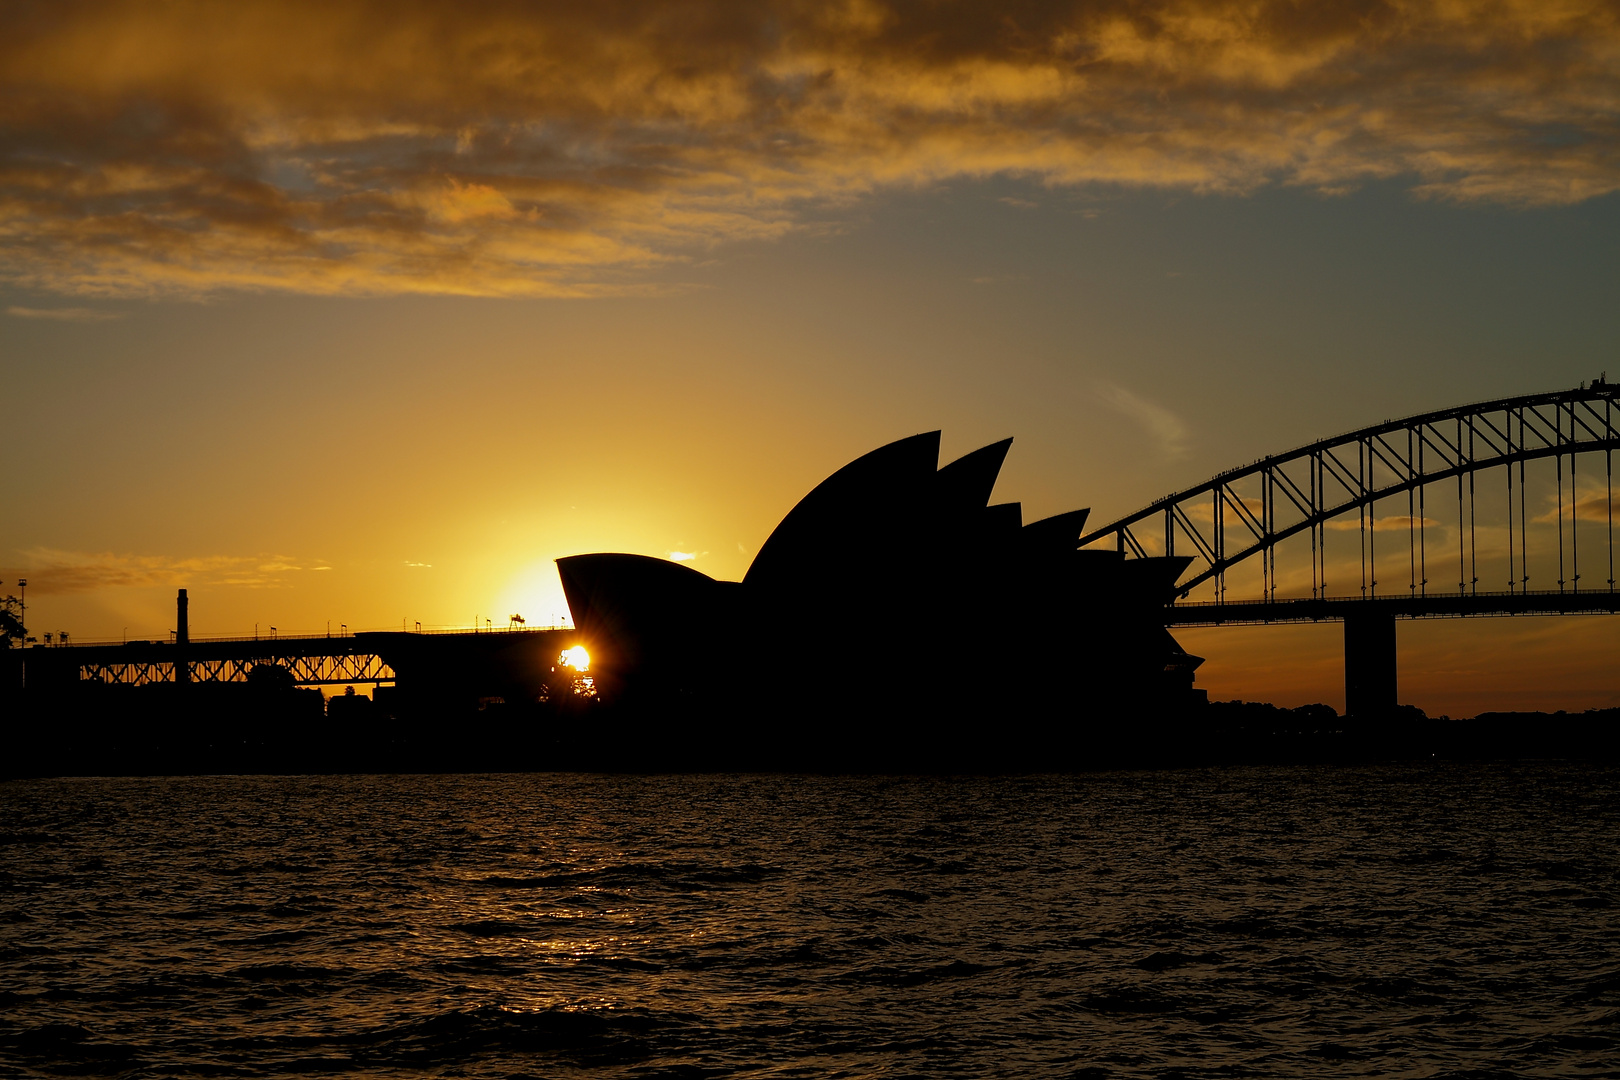 Sunset at the Opera